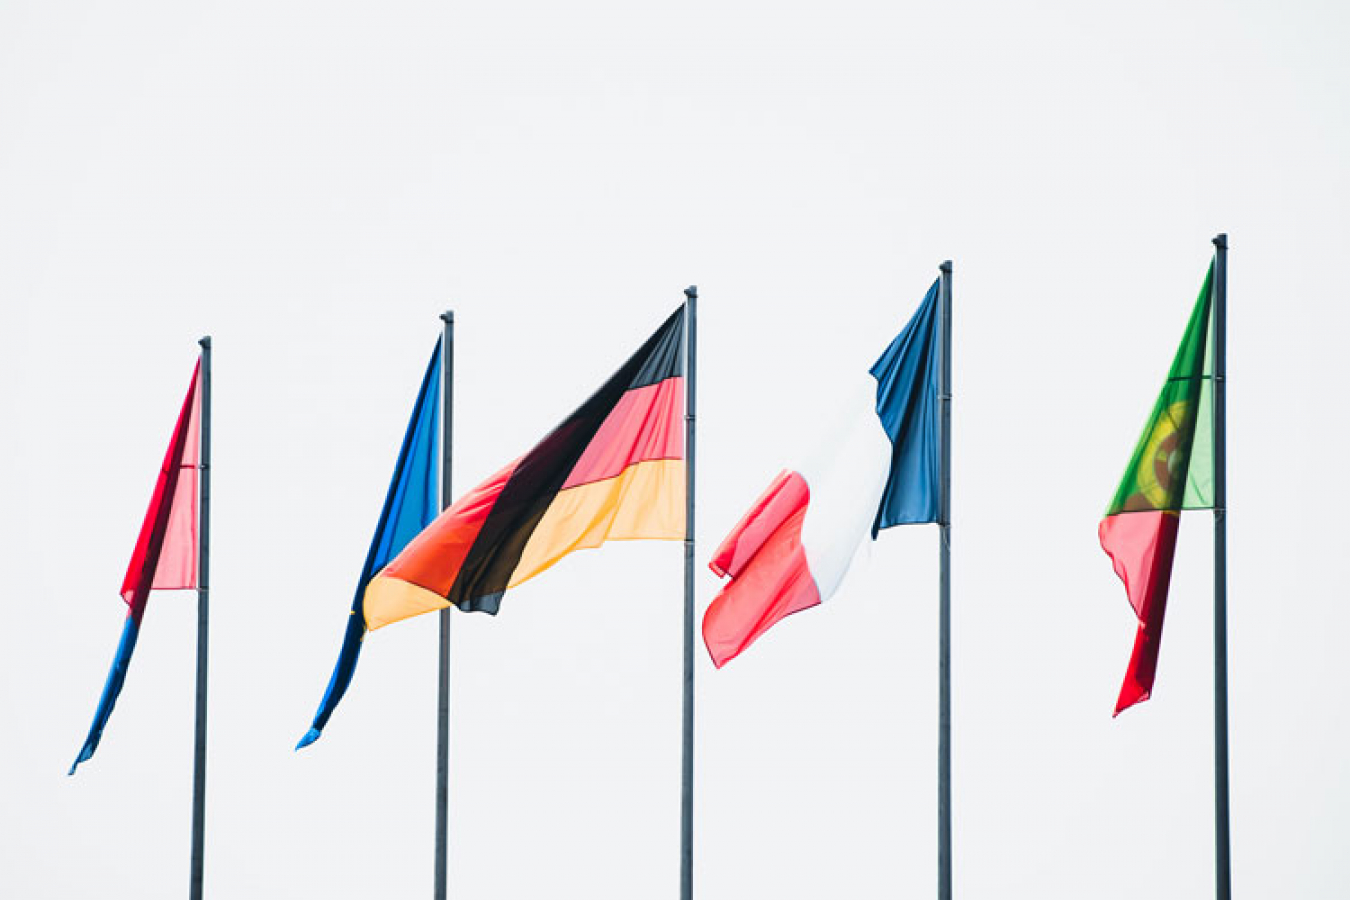 EU Countries' Flags